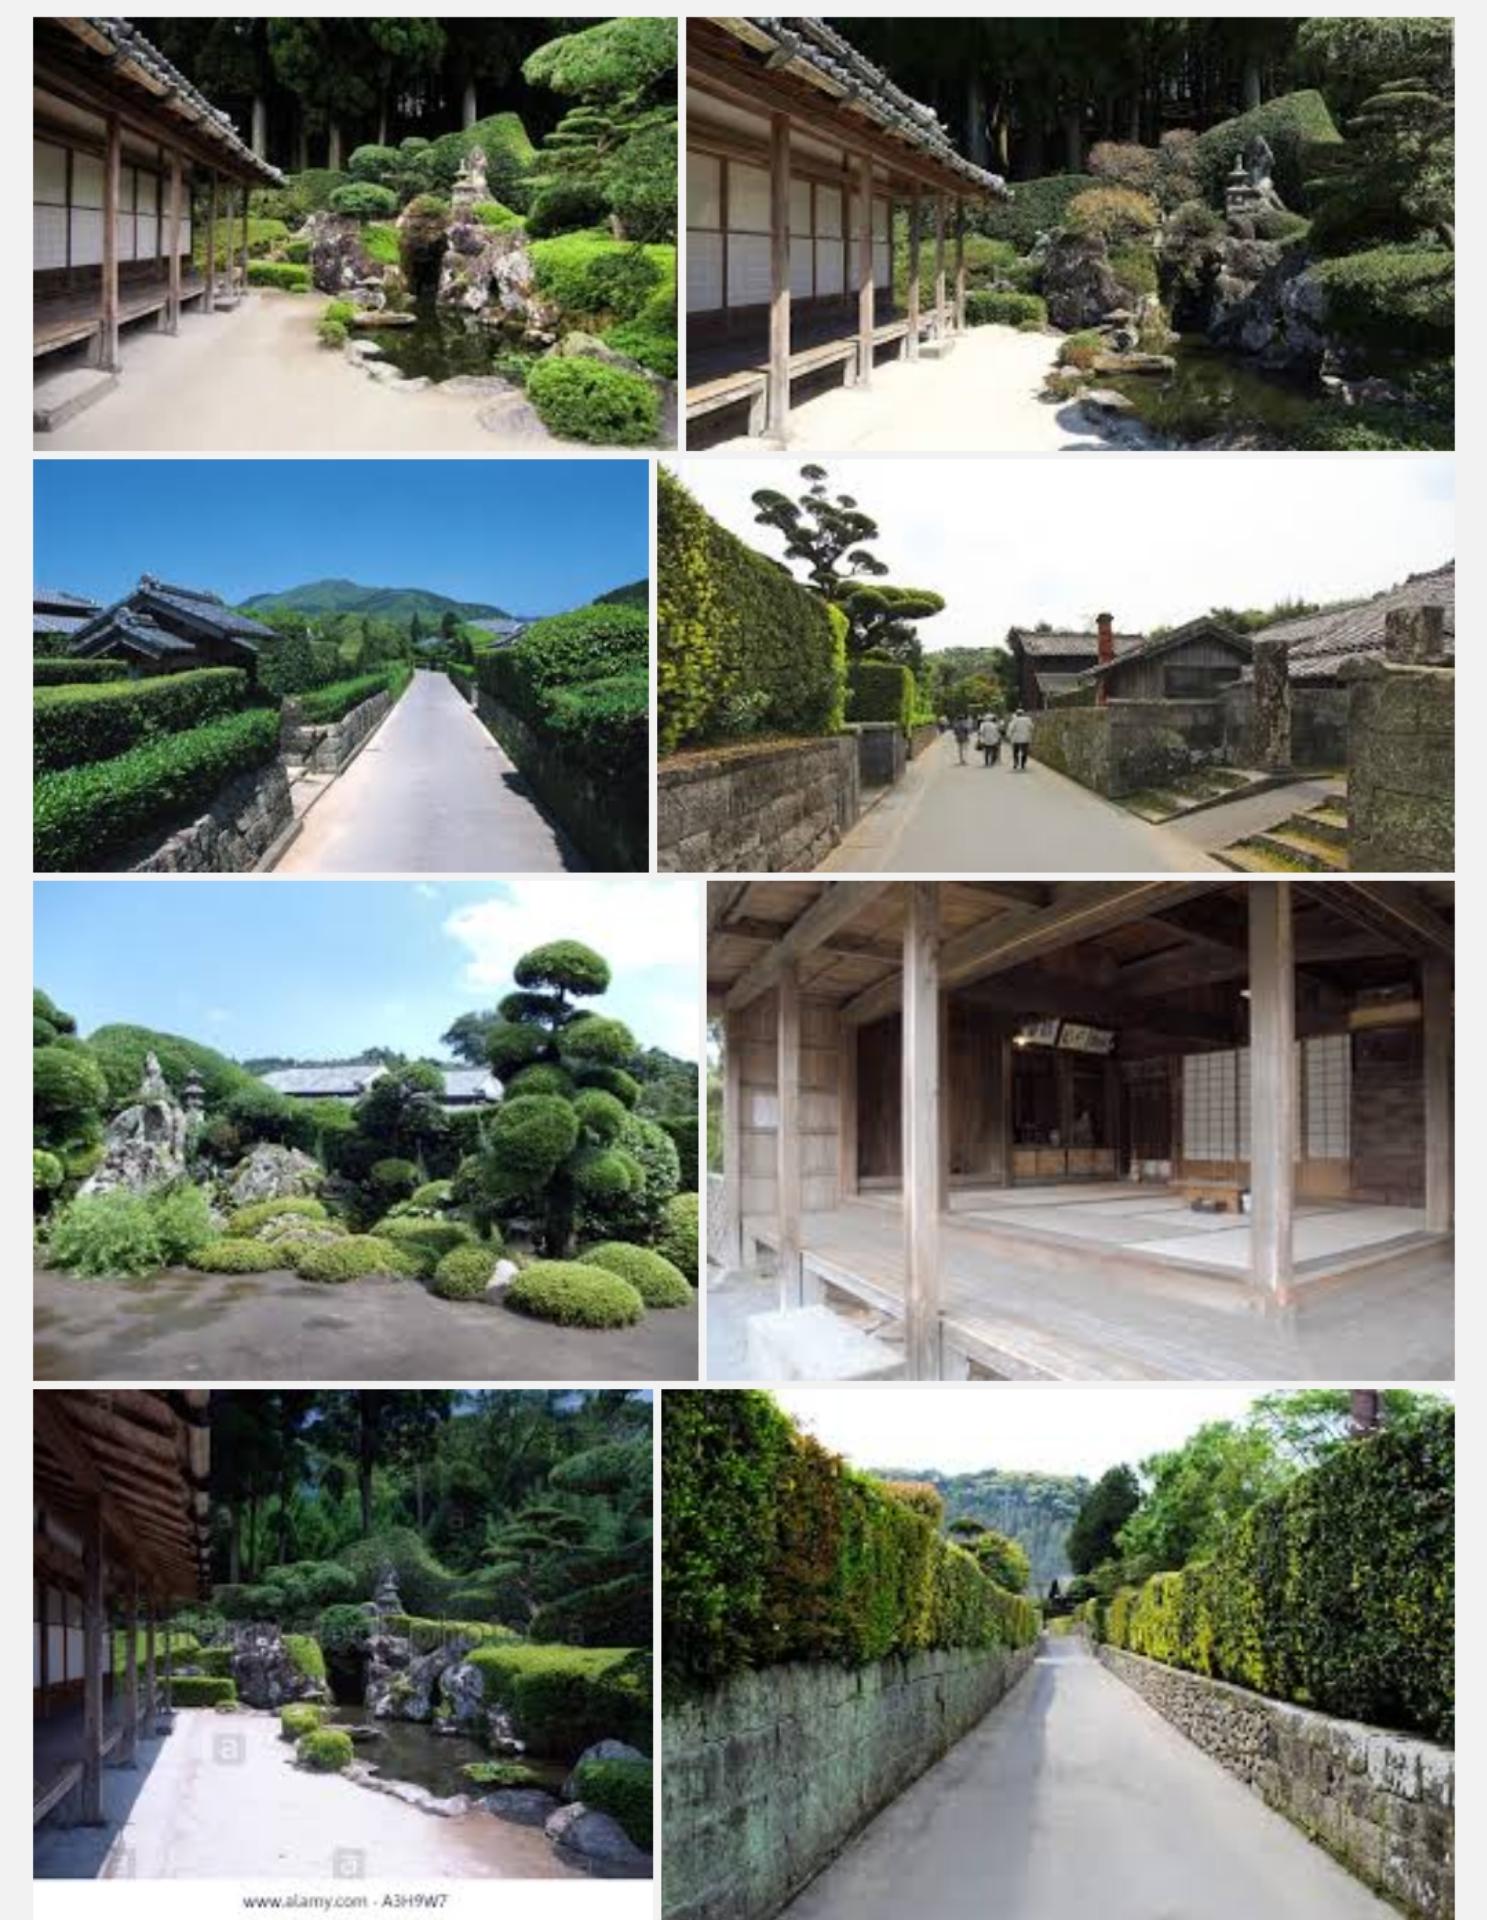 Melawat Chiran Samurai Residence...